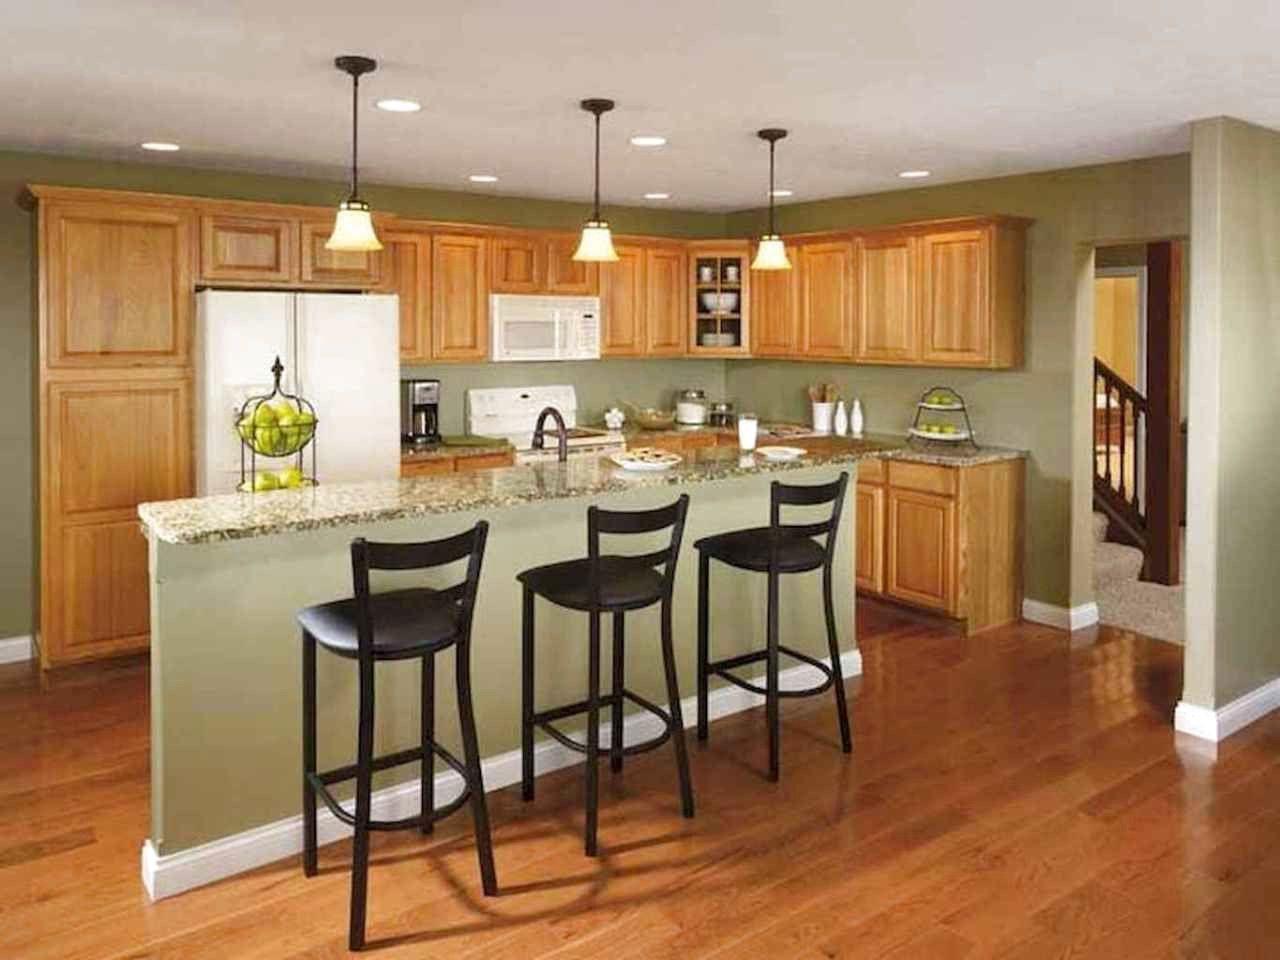 Best Black Kitchen Cabinets Design Ideas Green Kitchen Walls Hickory Kitchen Cabinets Kitchen Wall Colors